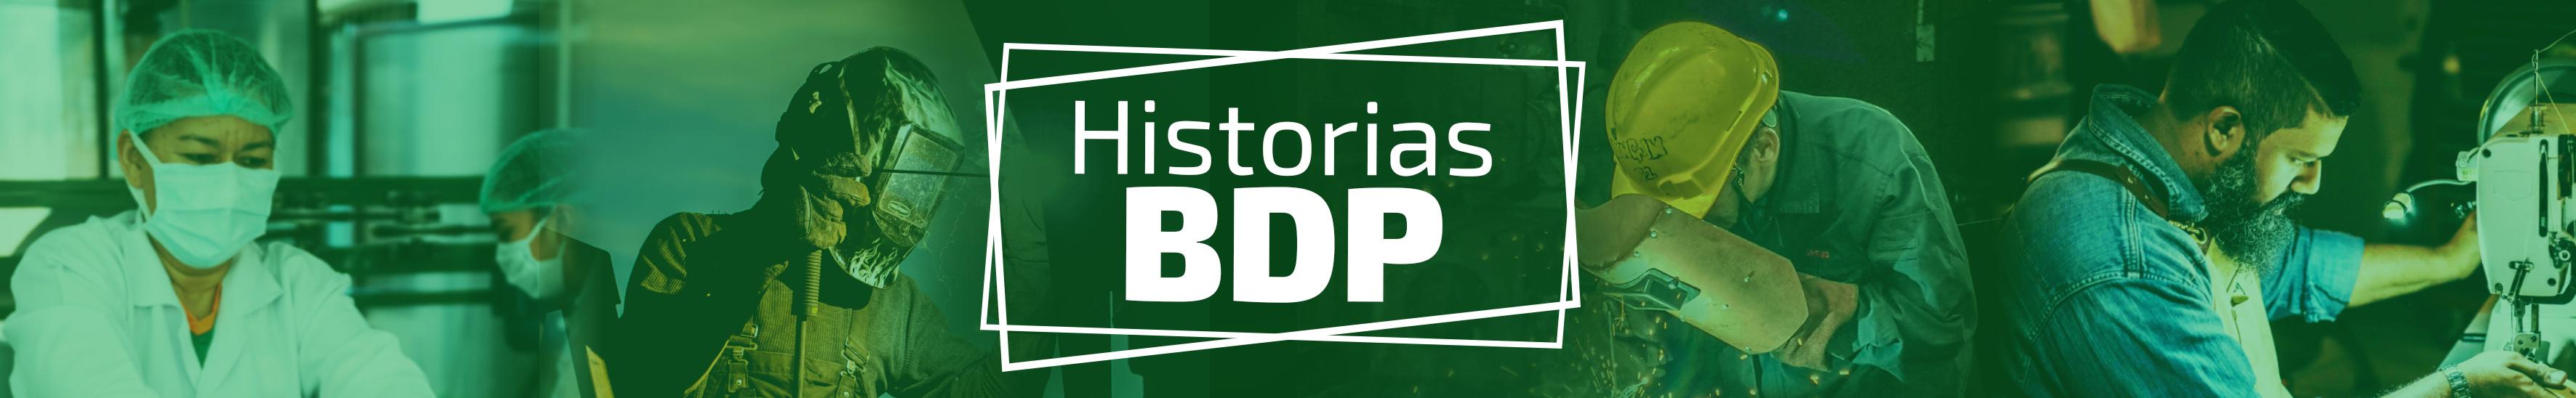 Banner ProductoresBDP